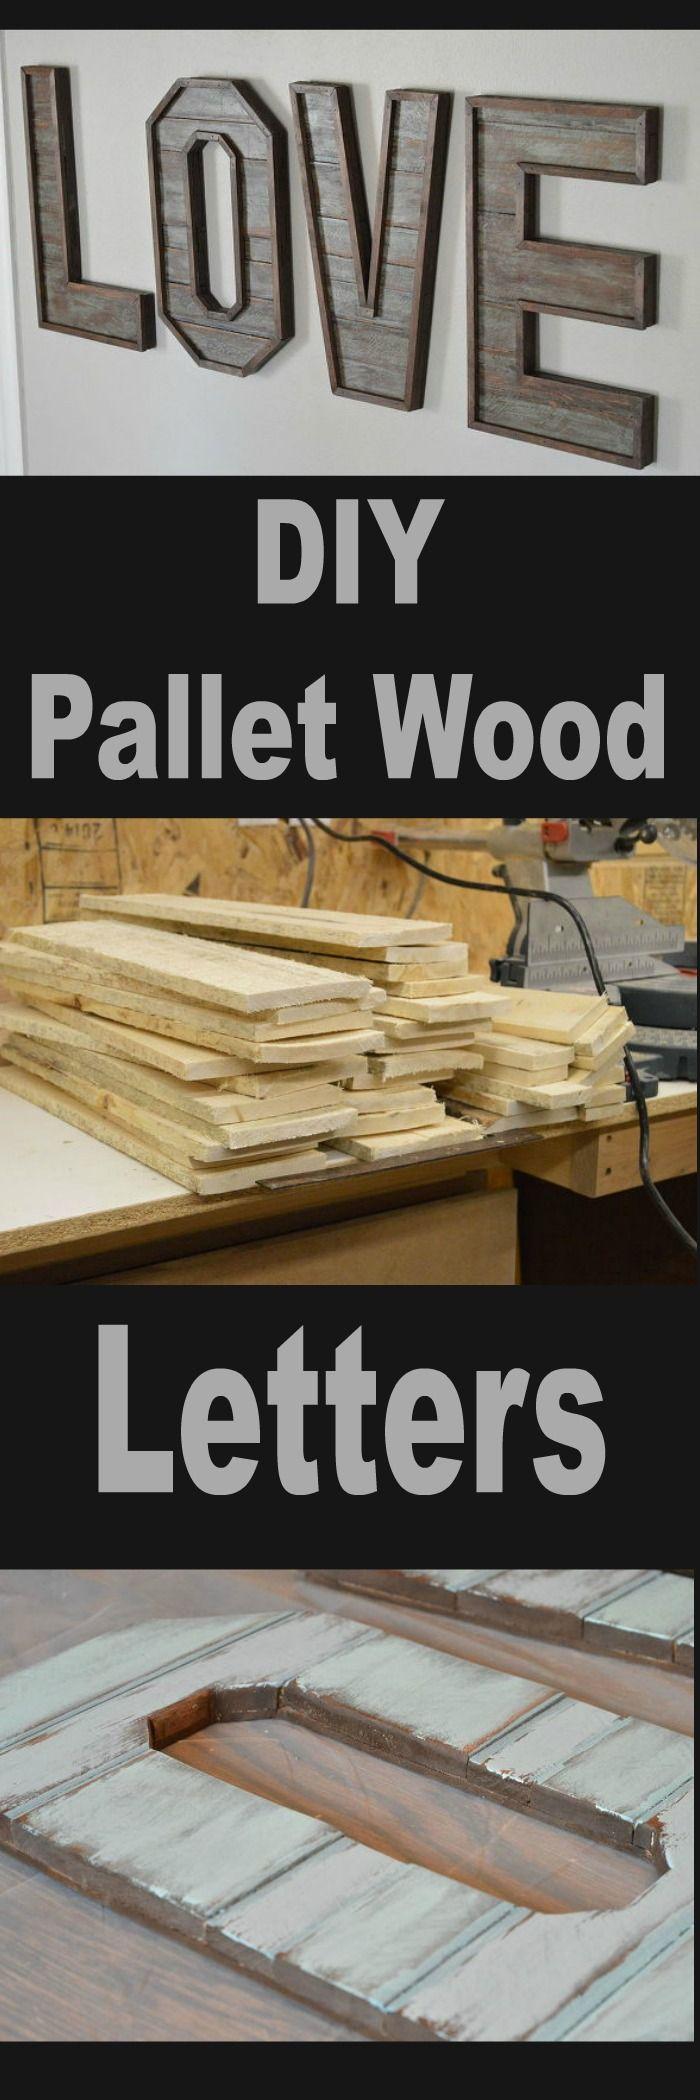 DIY Pallet Wood Letters